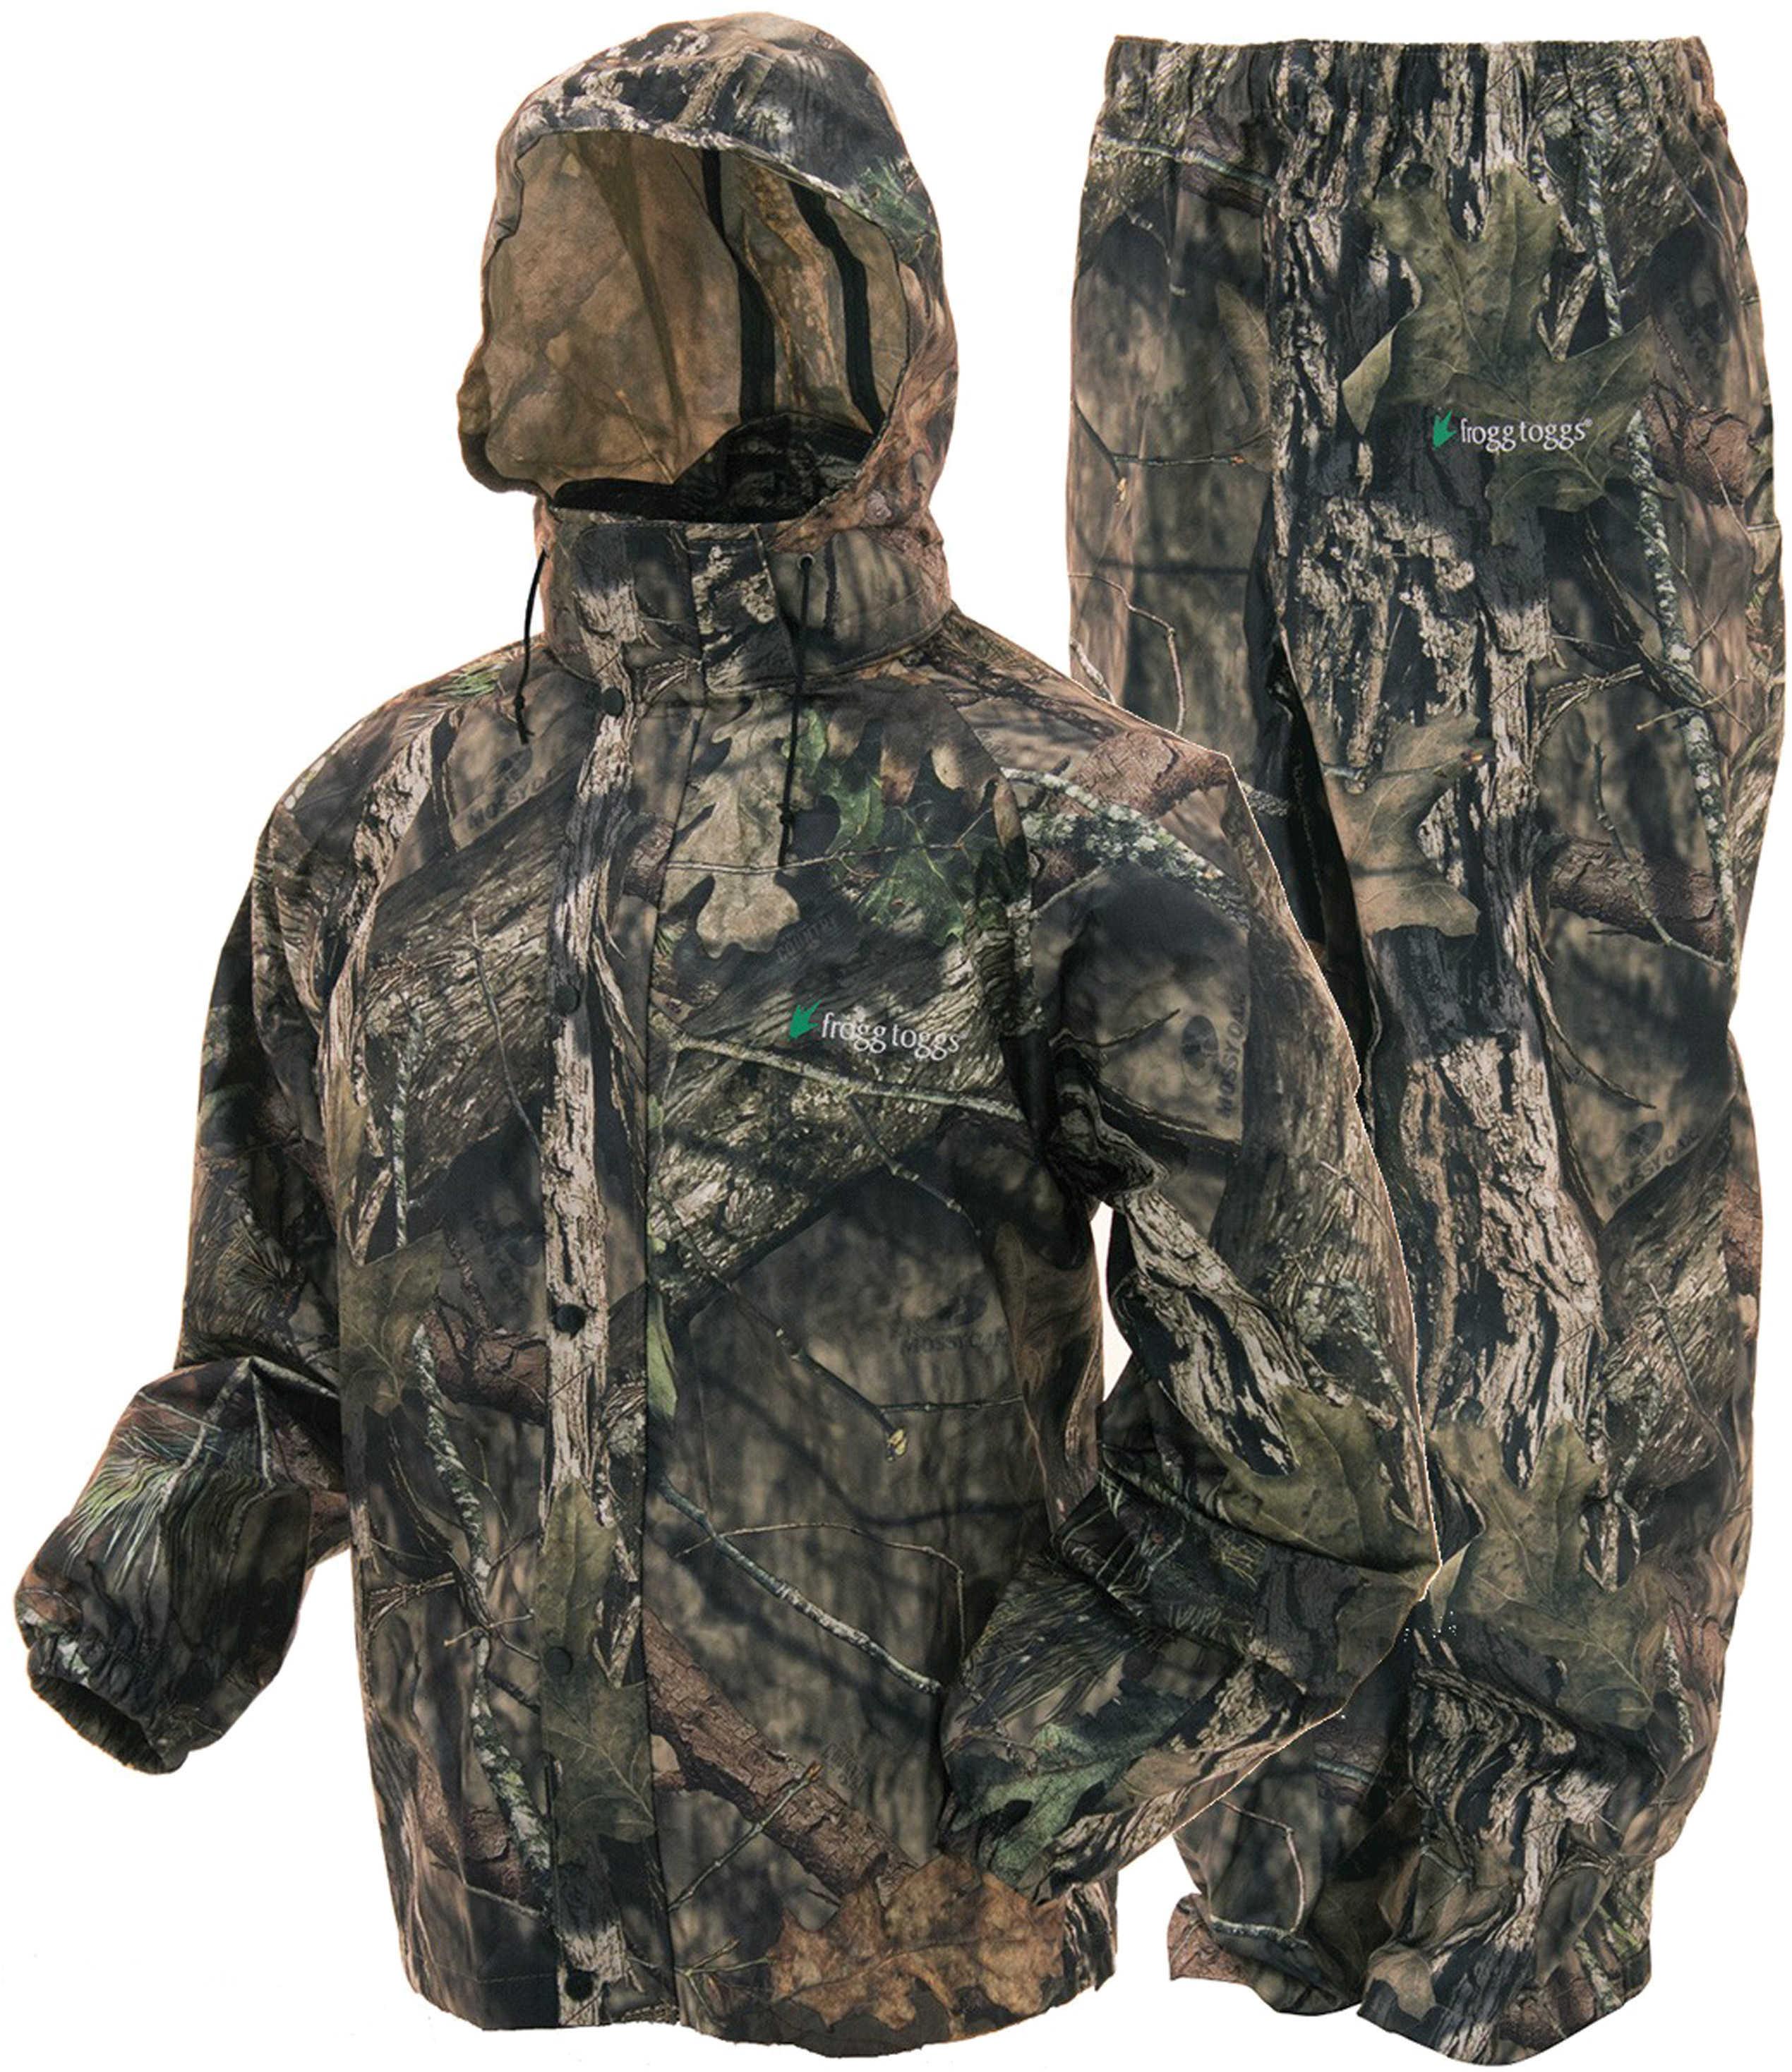 Frogg Toggs All Sport Rain Suit Mossy Oak Break Up Country Size-medium